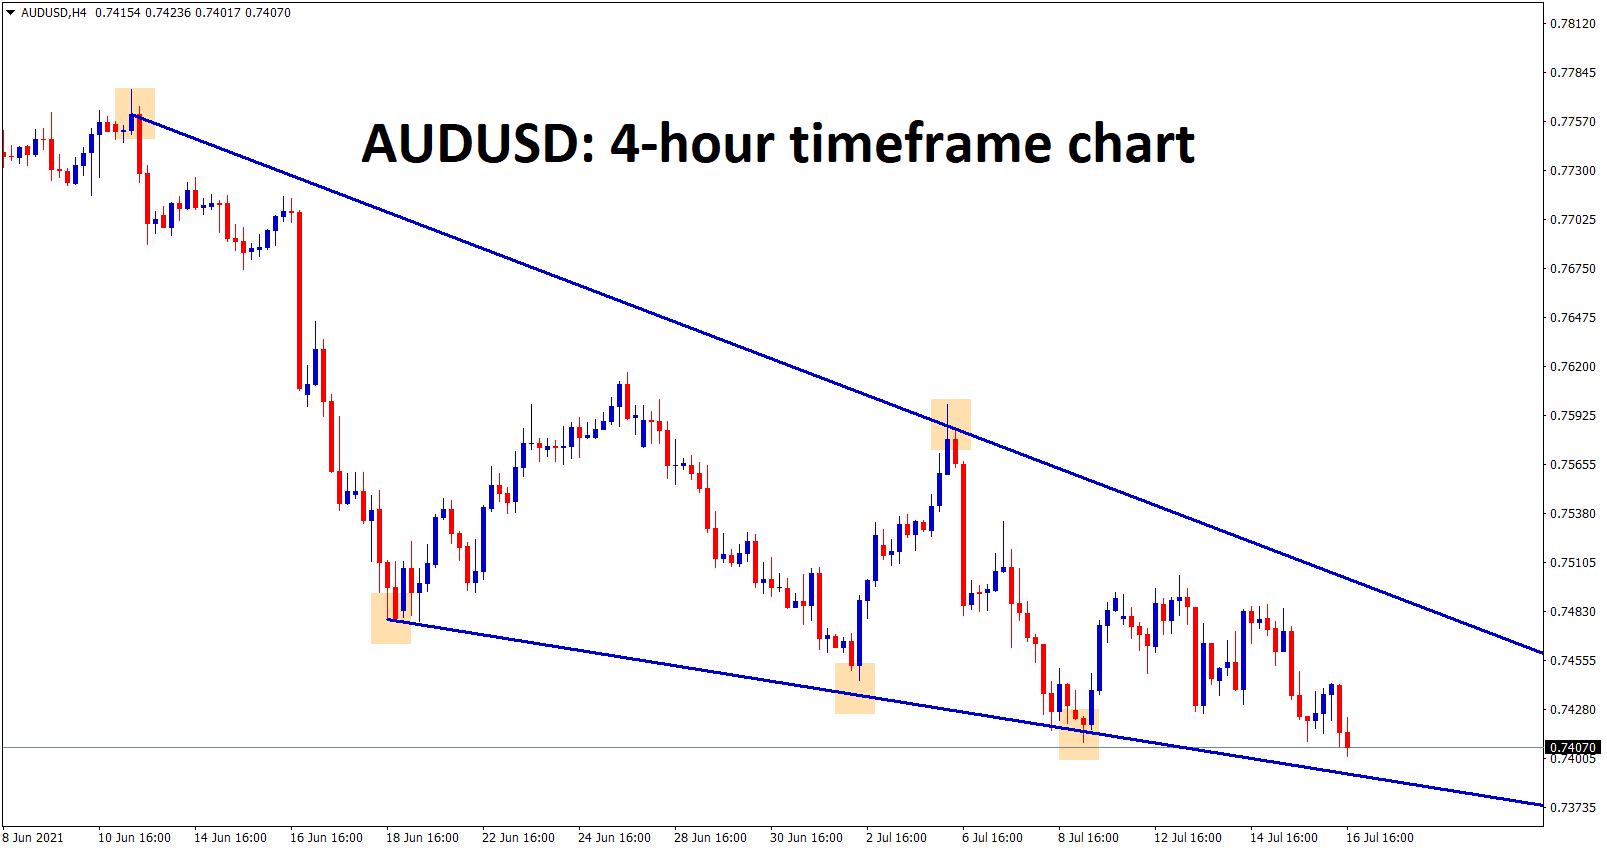 Falling wedge chart pattern found on AUDUSD wait for breakout